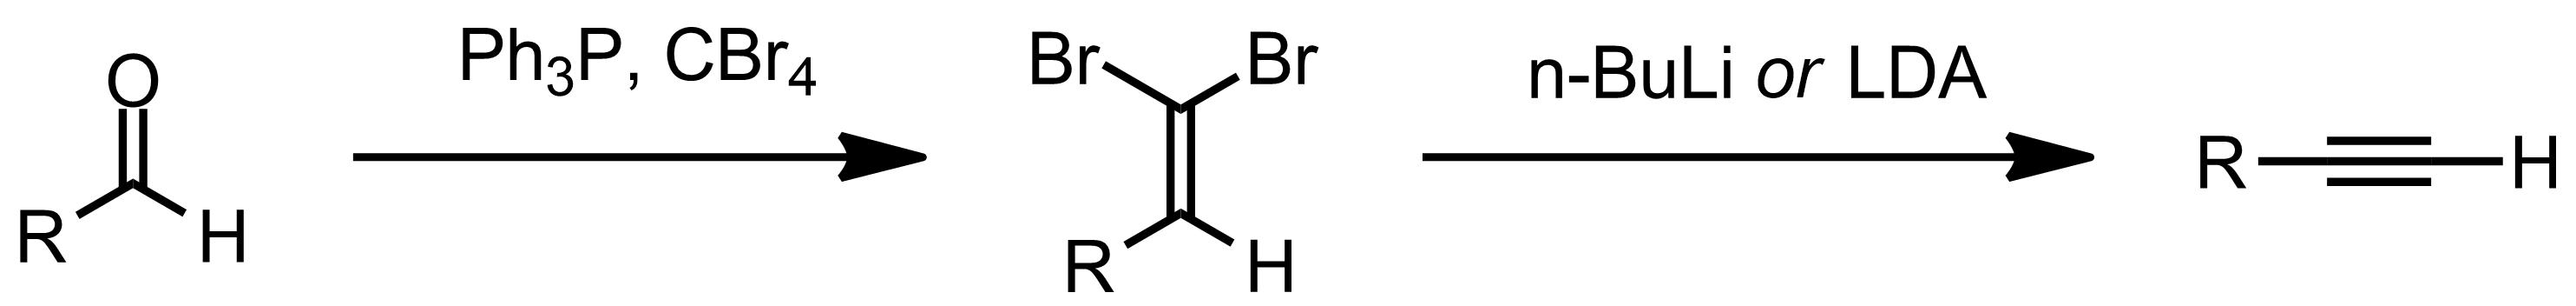 Schematic representation of the Corey-Fuchs Reaction.